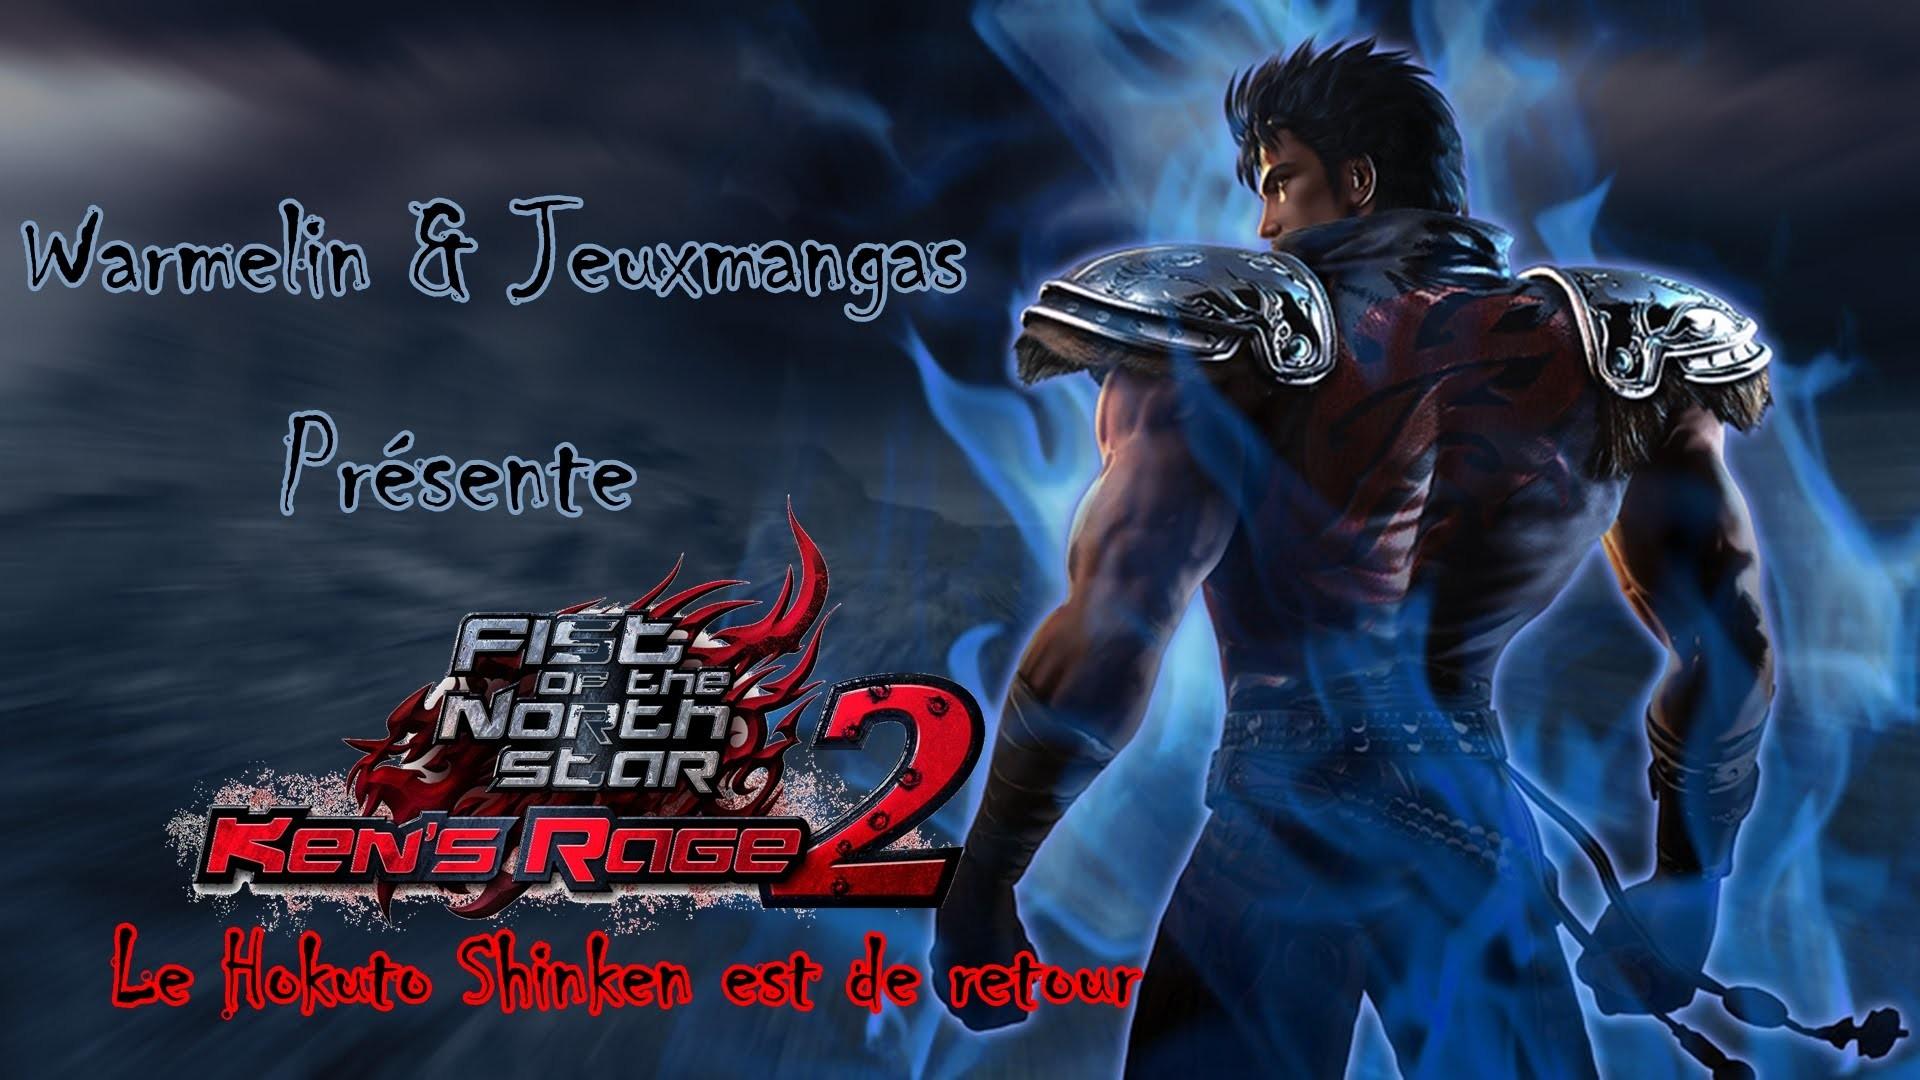 Rubrique Mangas Episode 4 : Fist of the North Star Ken's Rage 2